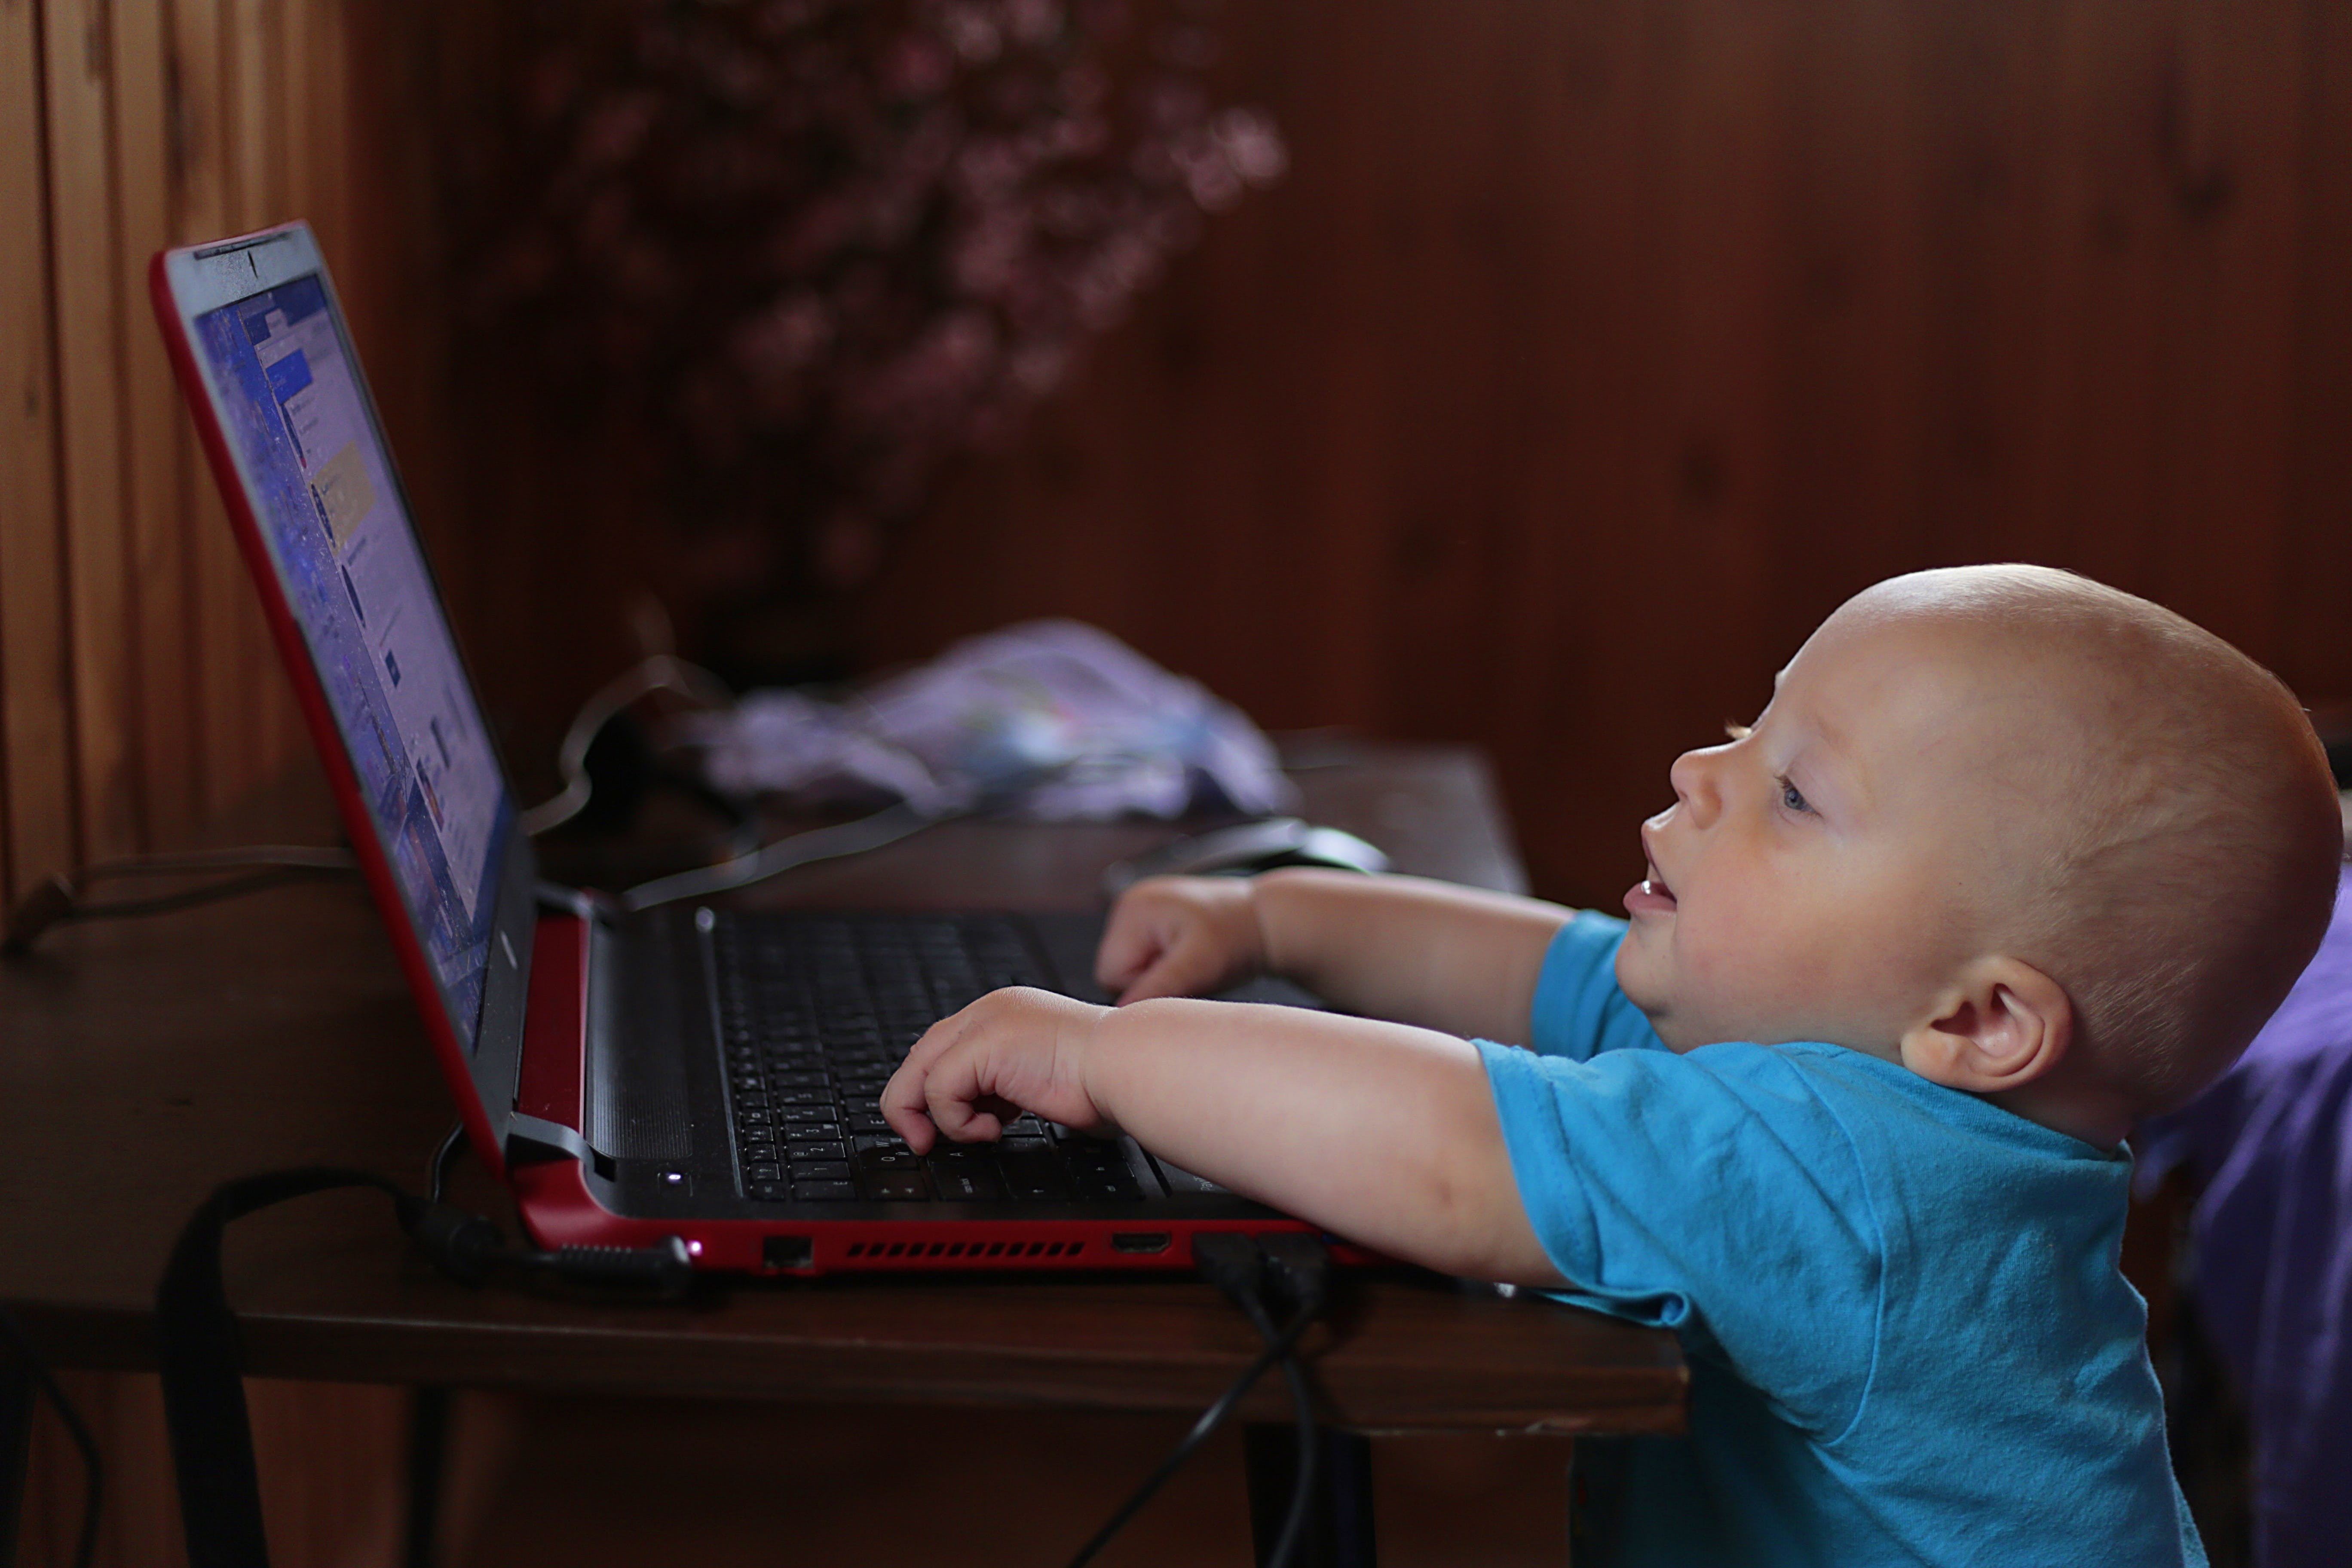 Boy Wearing Blue T Shirt Using Black Laptop Computer in a Dim Lighted Scenario